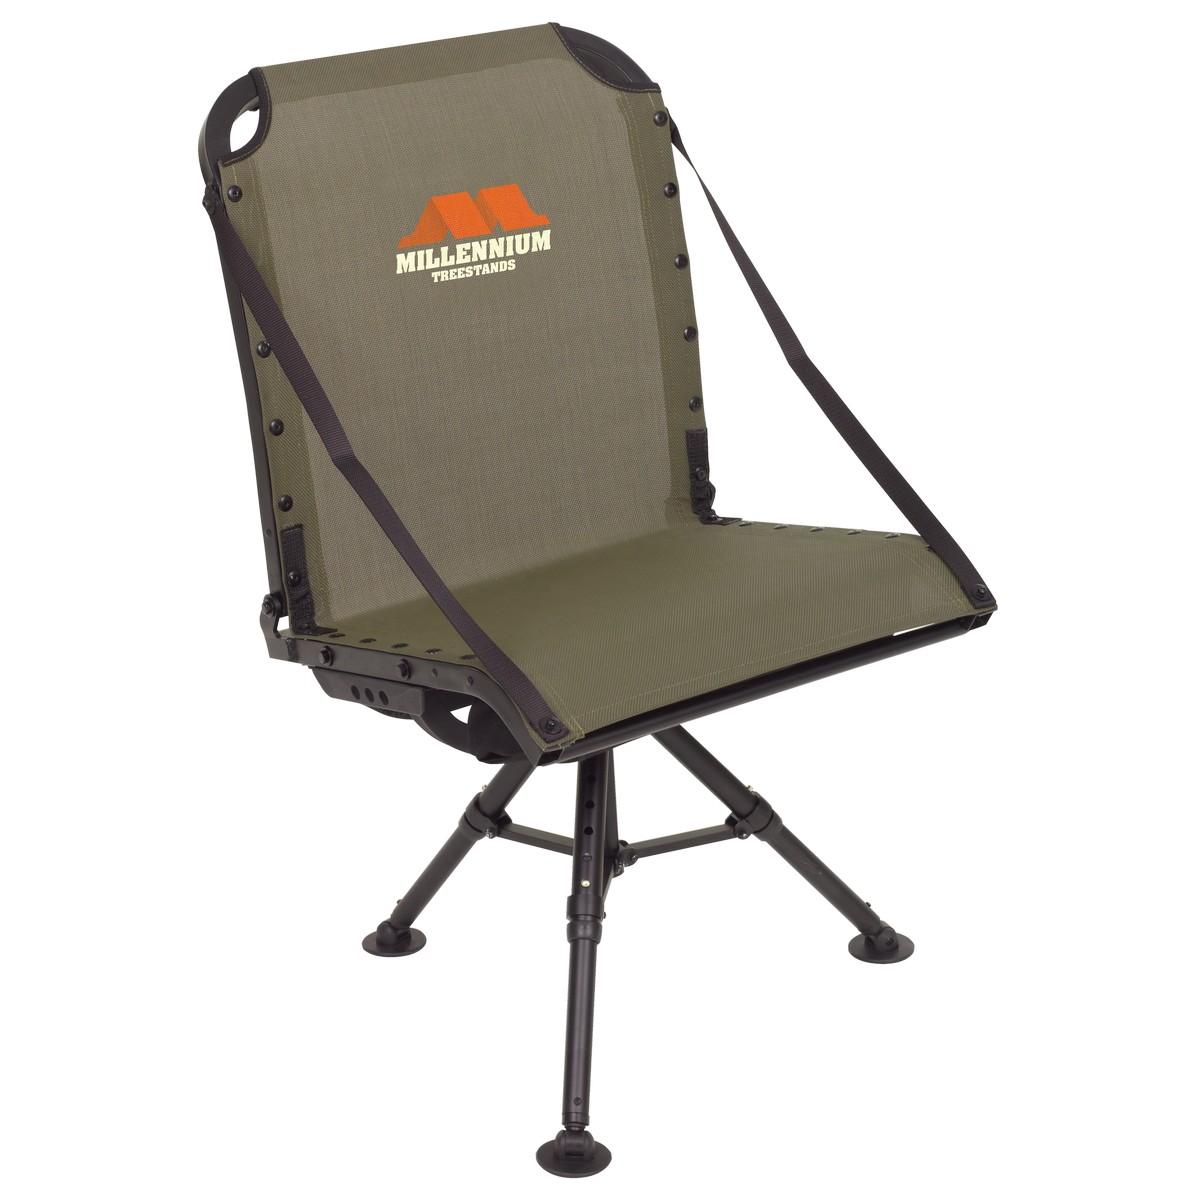 Pleasant Hunting Solutions Millennium Ground Blind Chair Machost Co Dining Chair Design Ideas Machostcouk